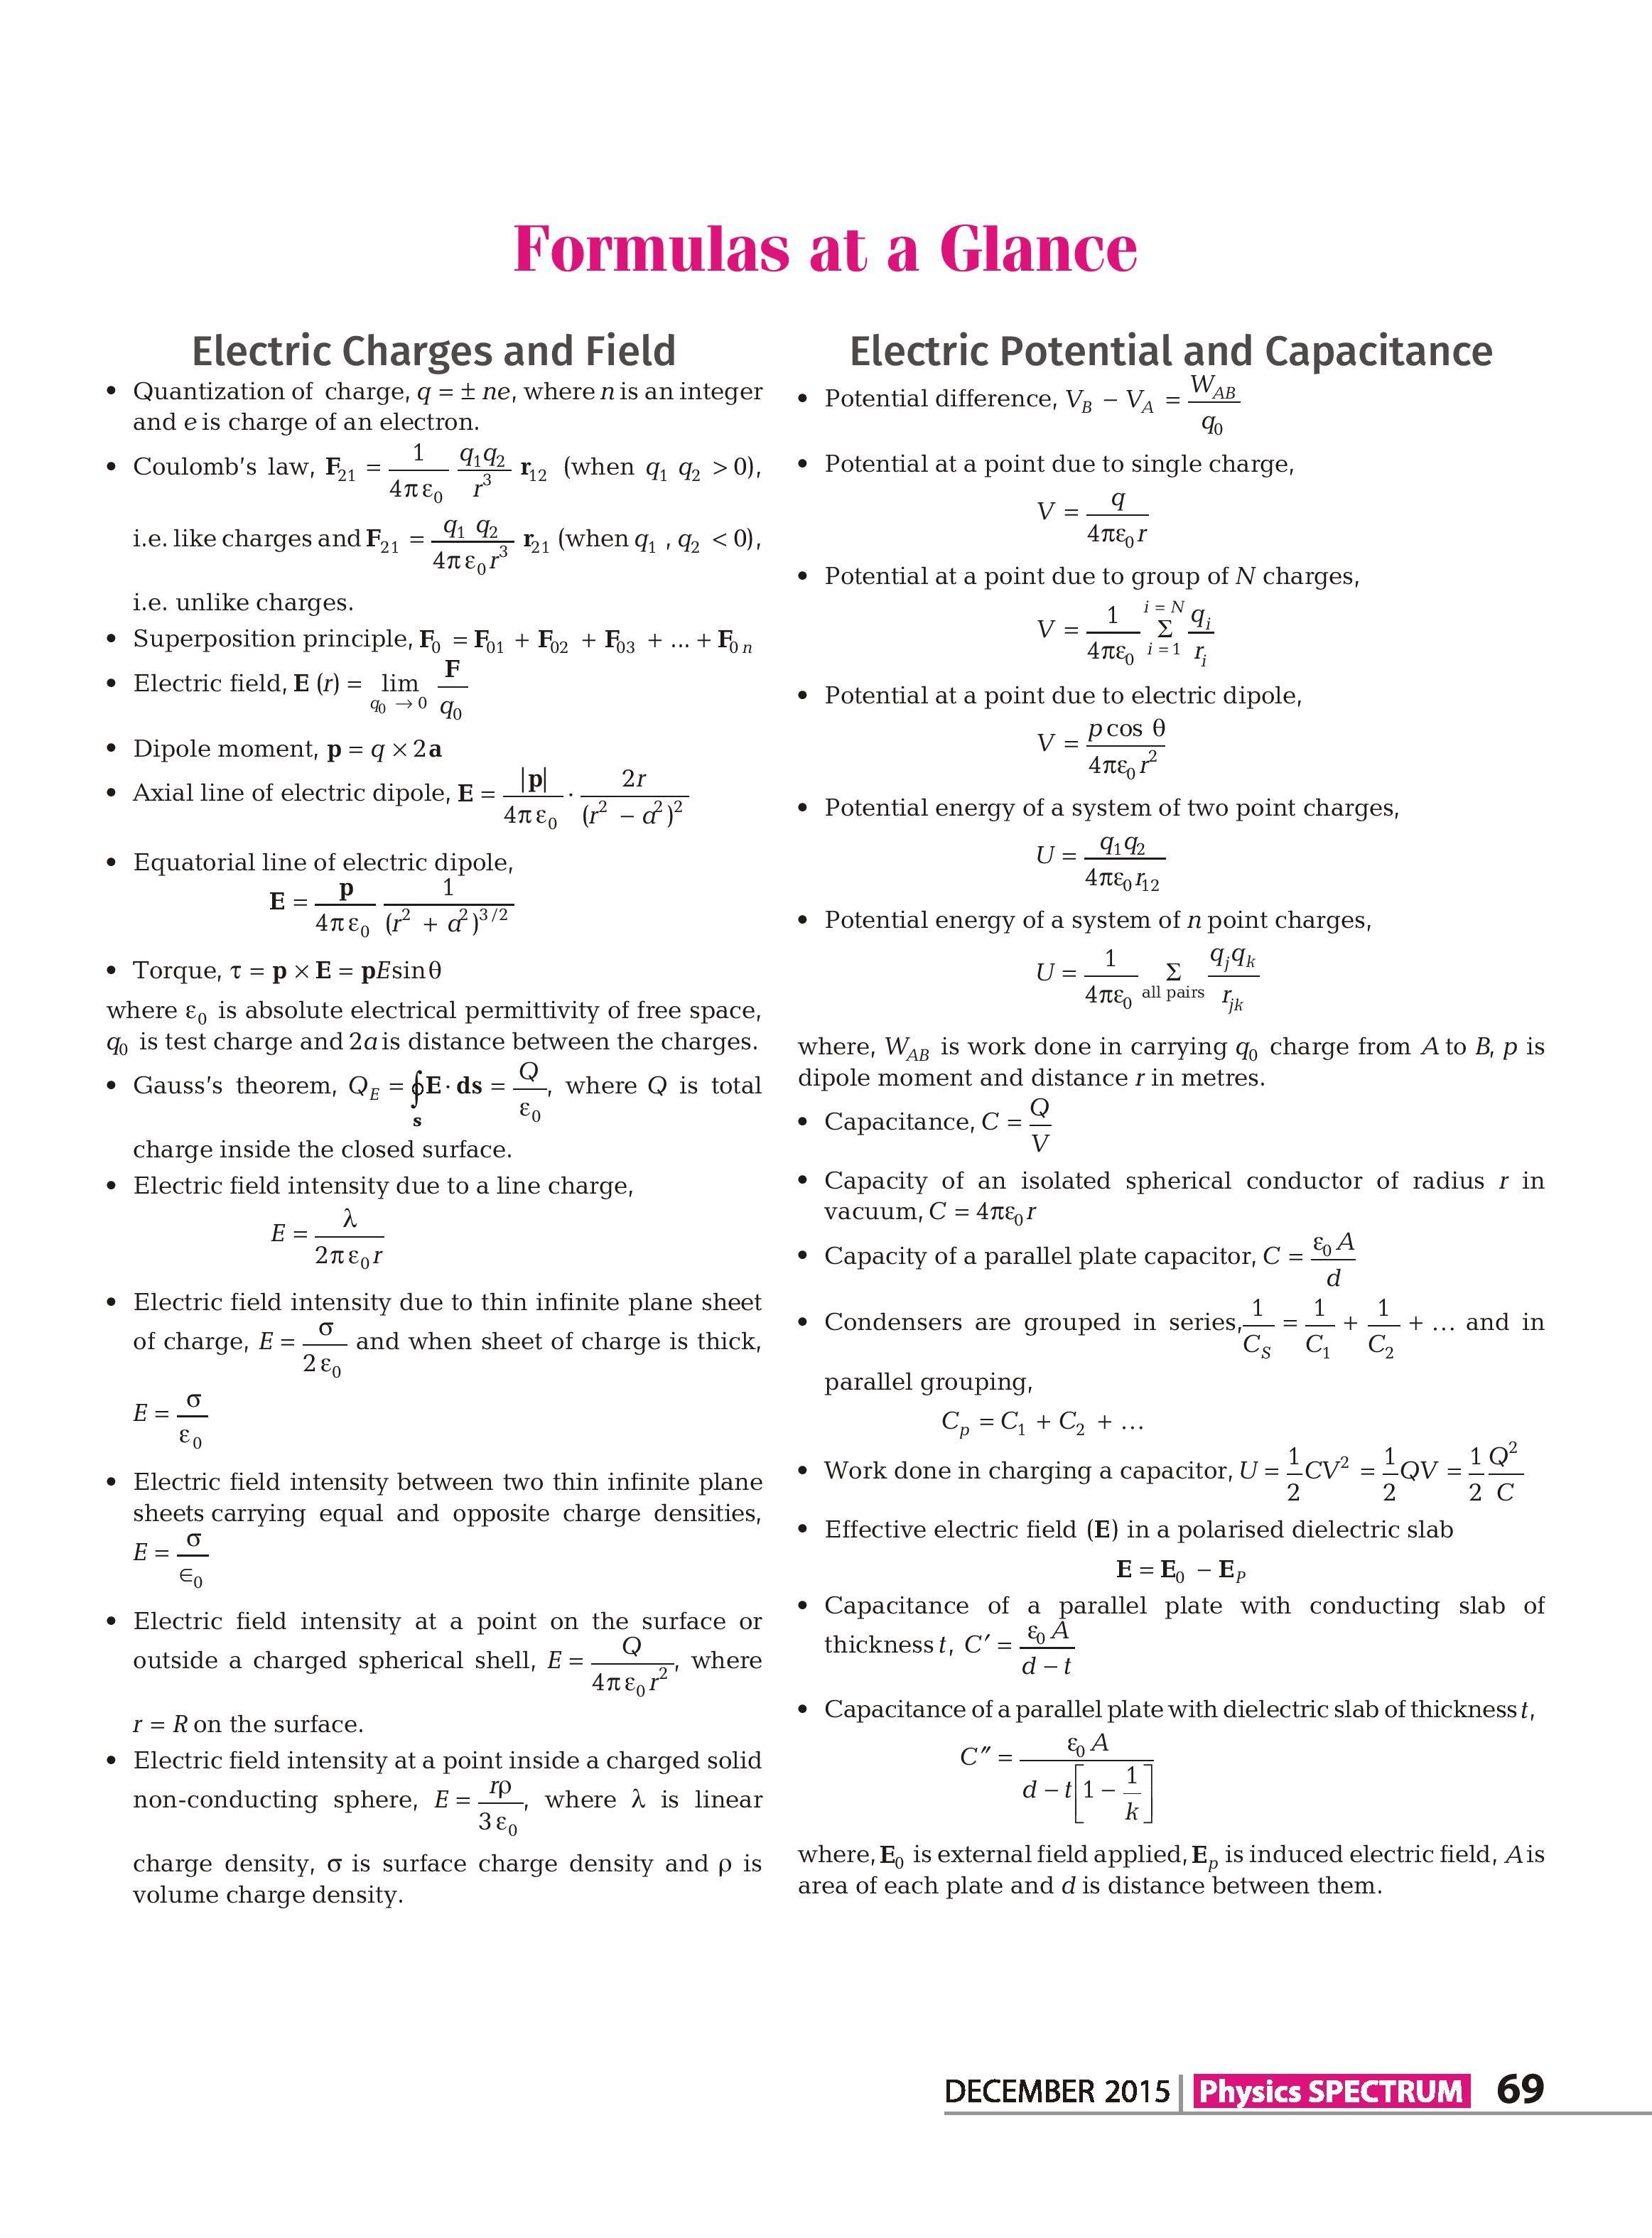 Formulas Arihant Physics Spectrum Magazine Physics Notes How To Study Physics All Physics Formulas